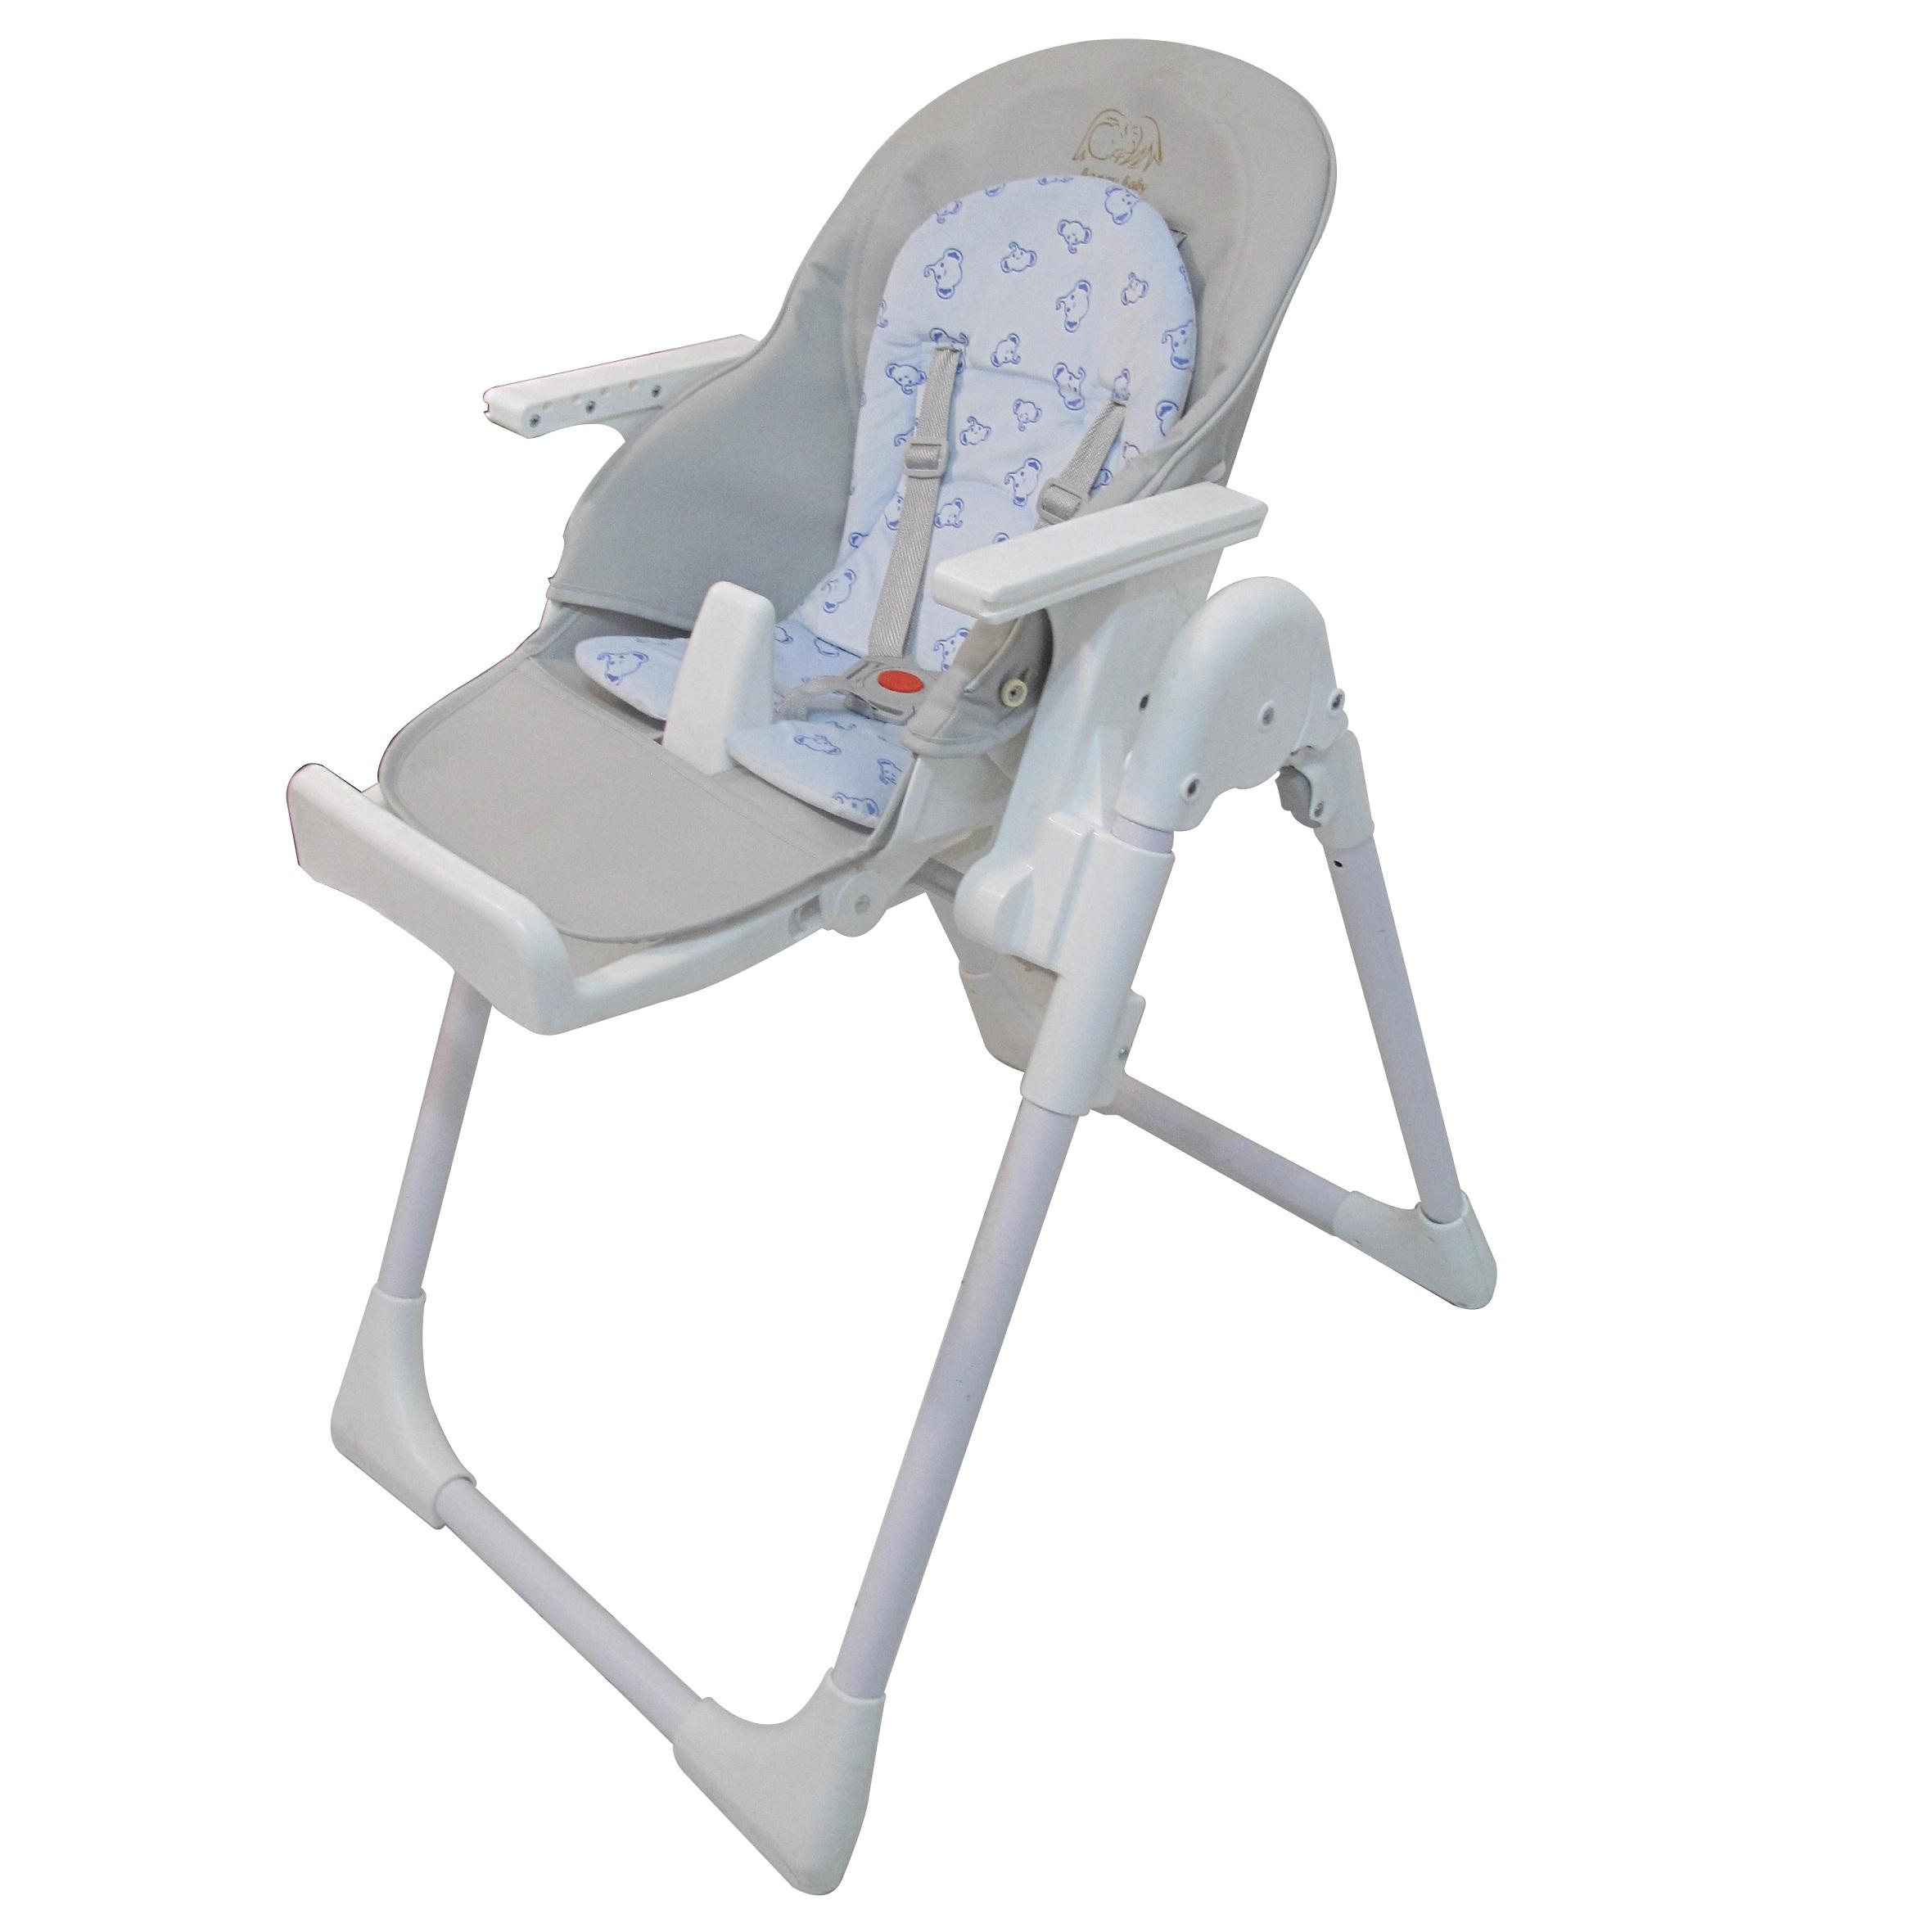 صندلی غذاخوری کودک هپی بی بی مدل F-400 main 1 16